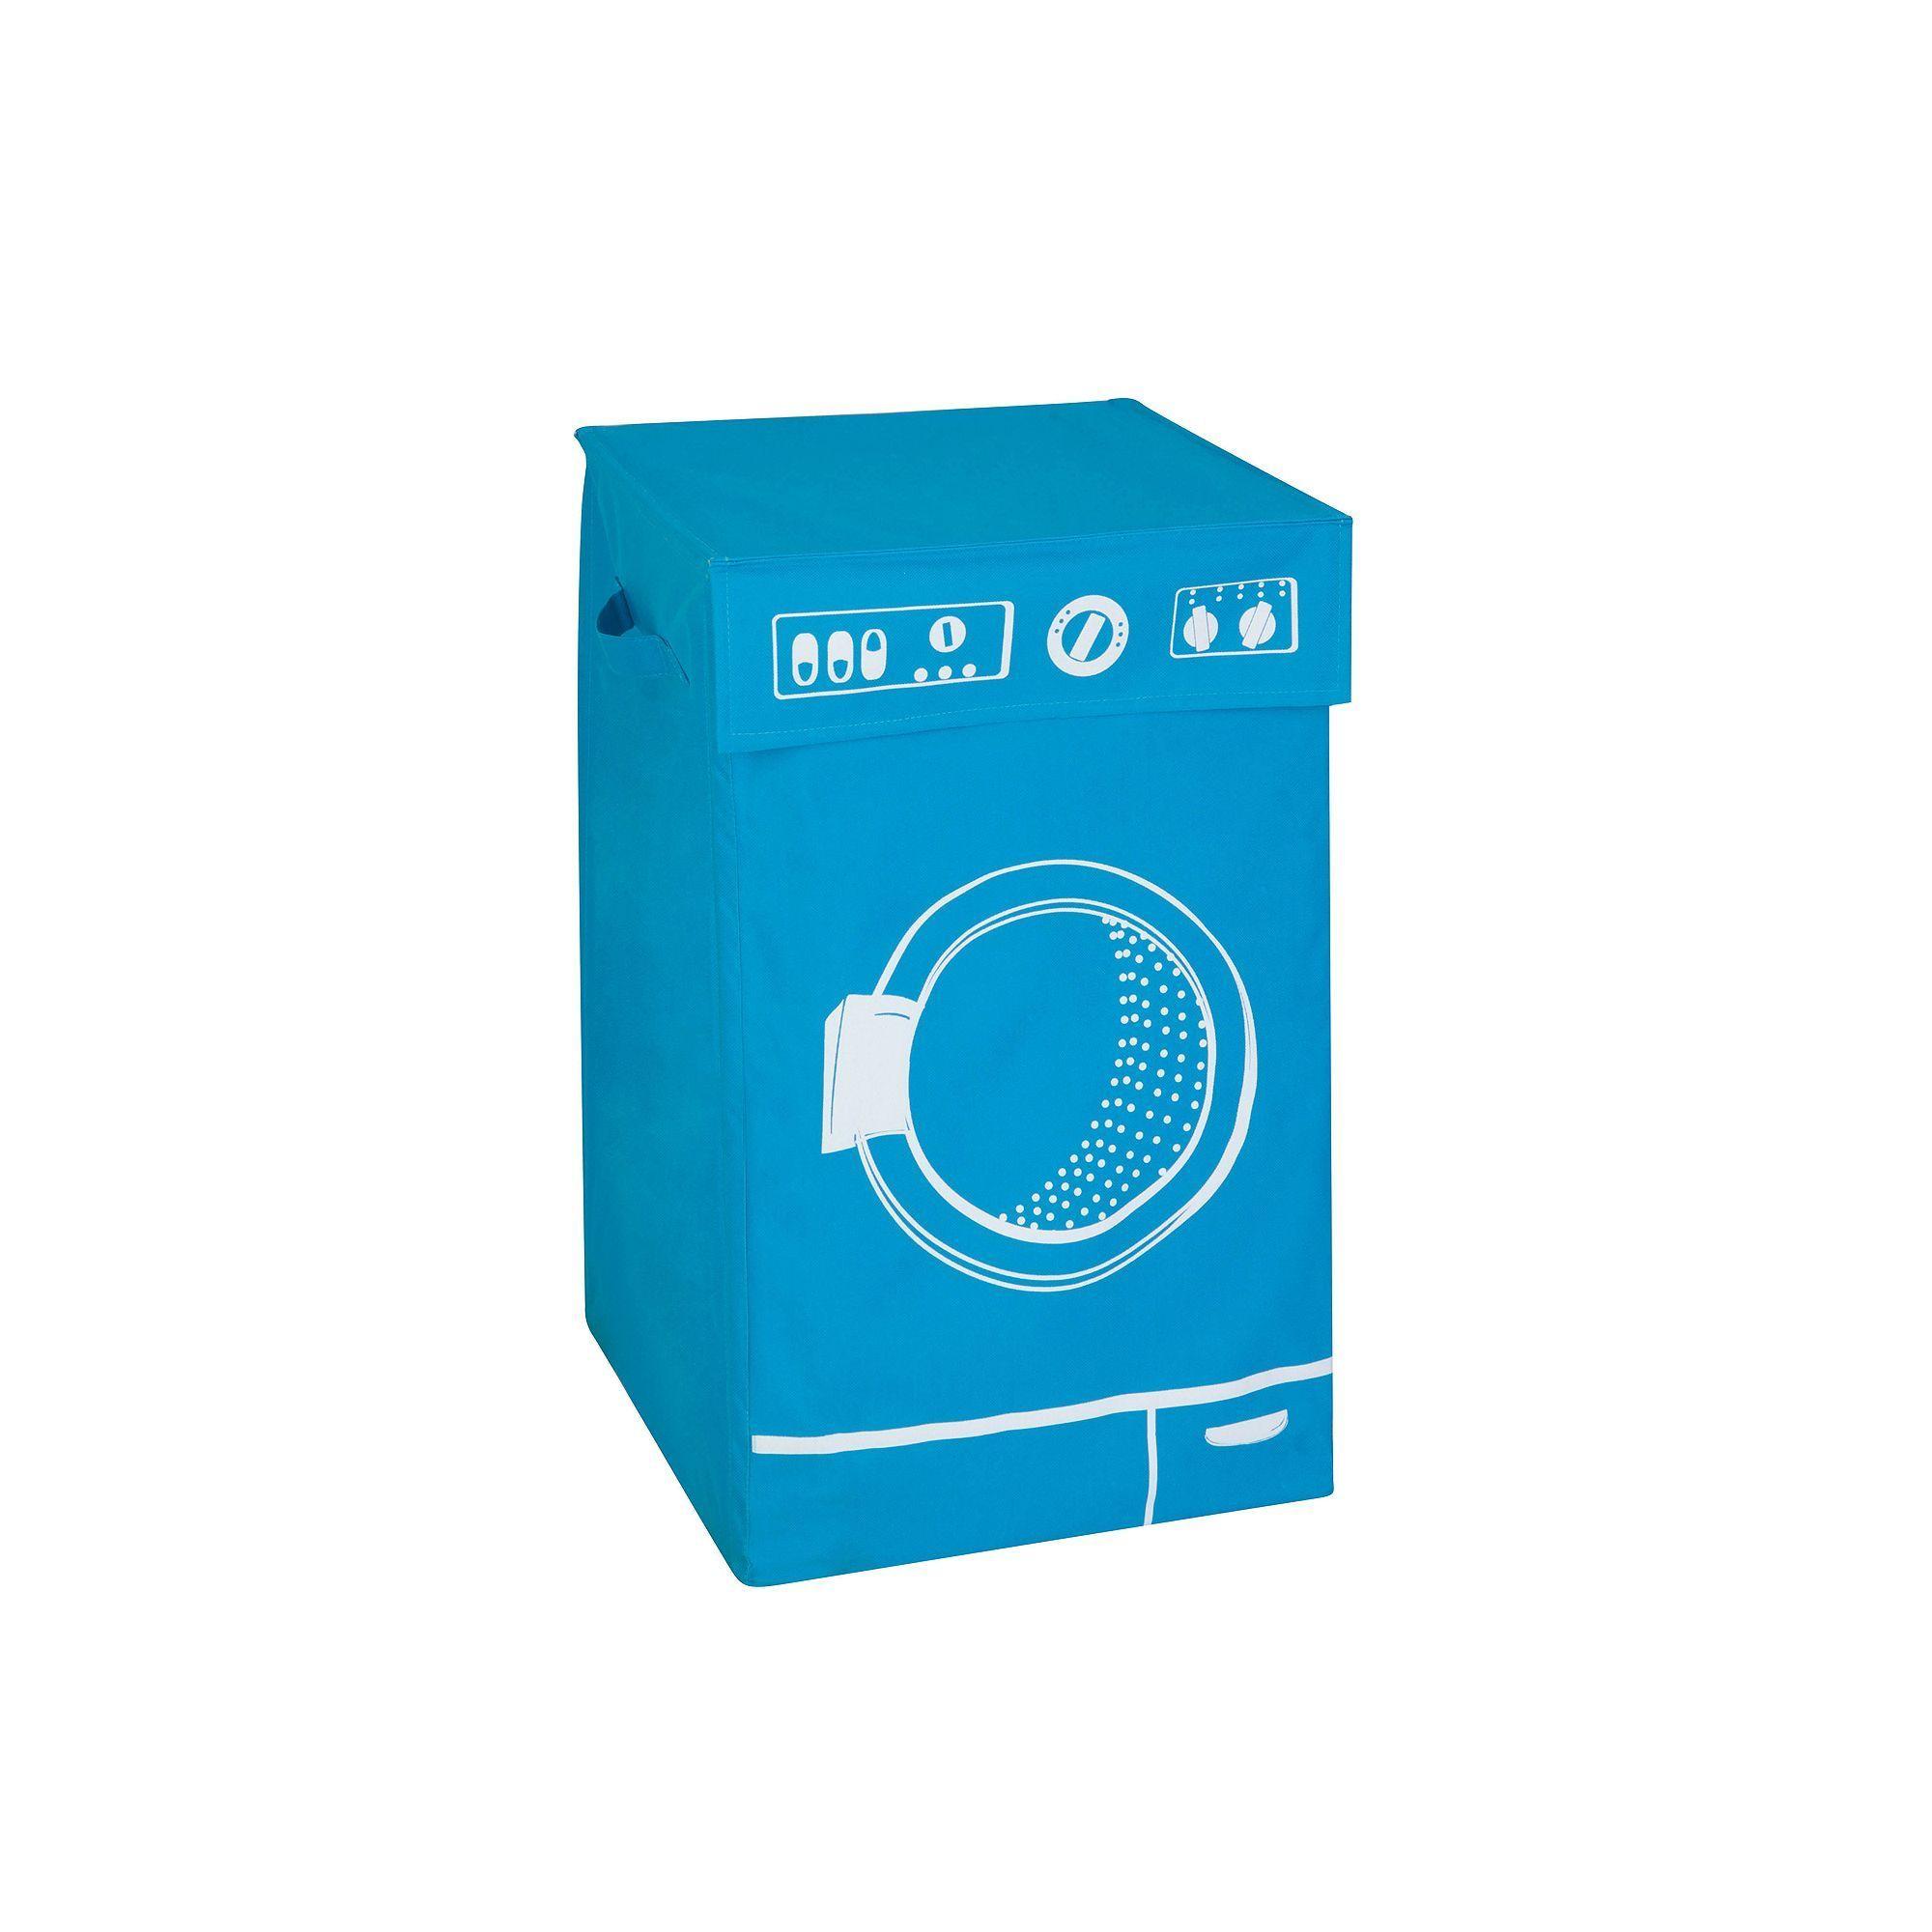 Honey-Can-Do Graphic Washing Machine Hamper With Lid | Washing ...